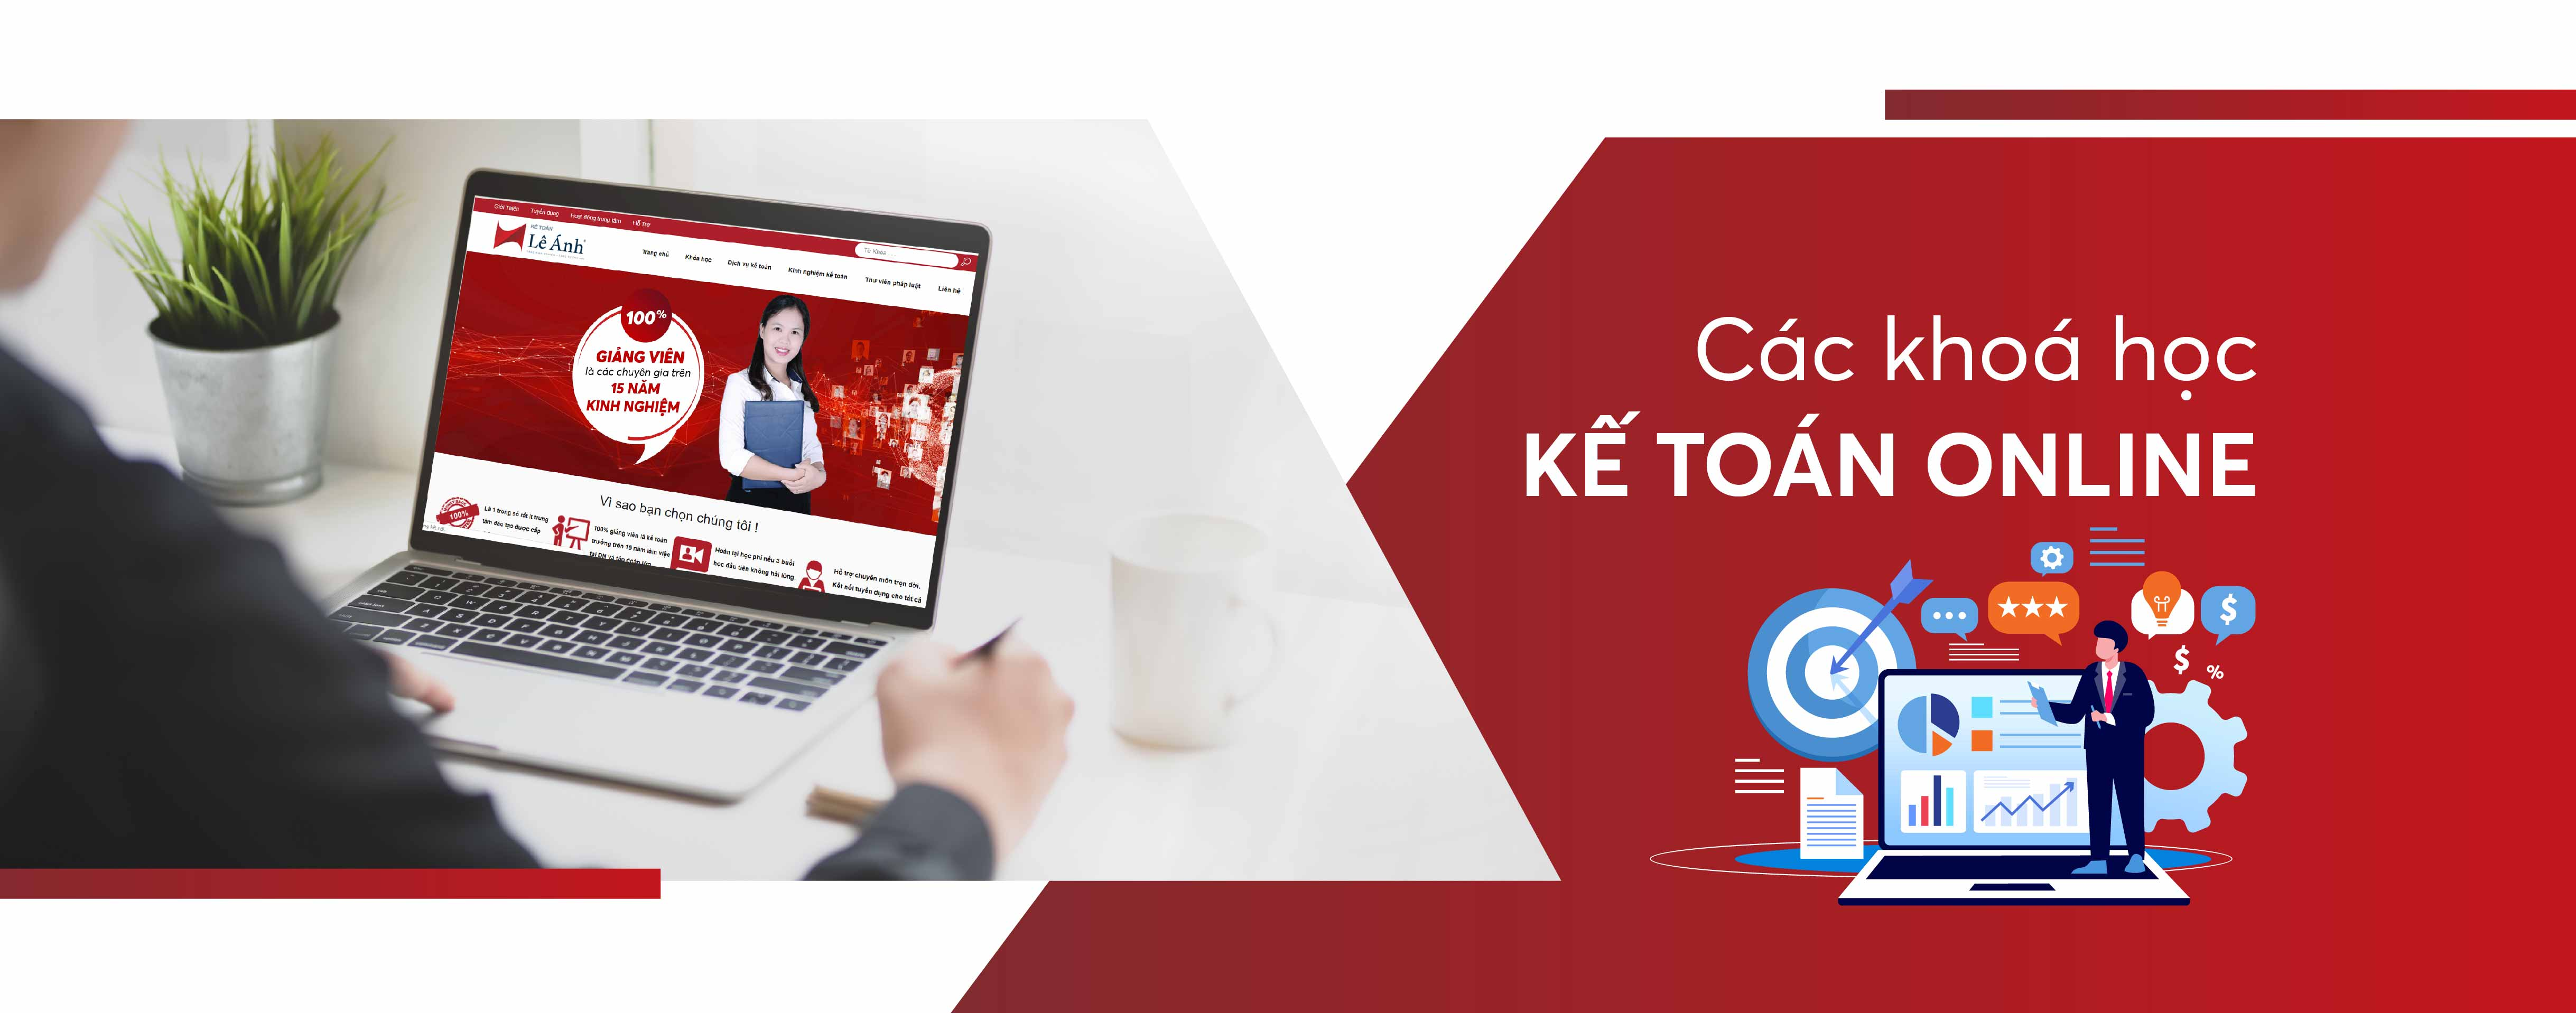 cac-khoa-hoc-ke-toan-online